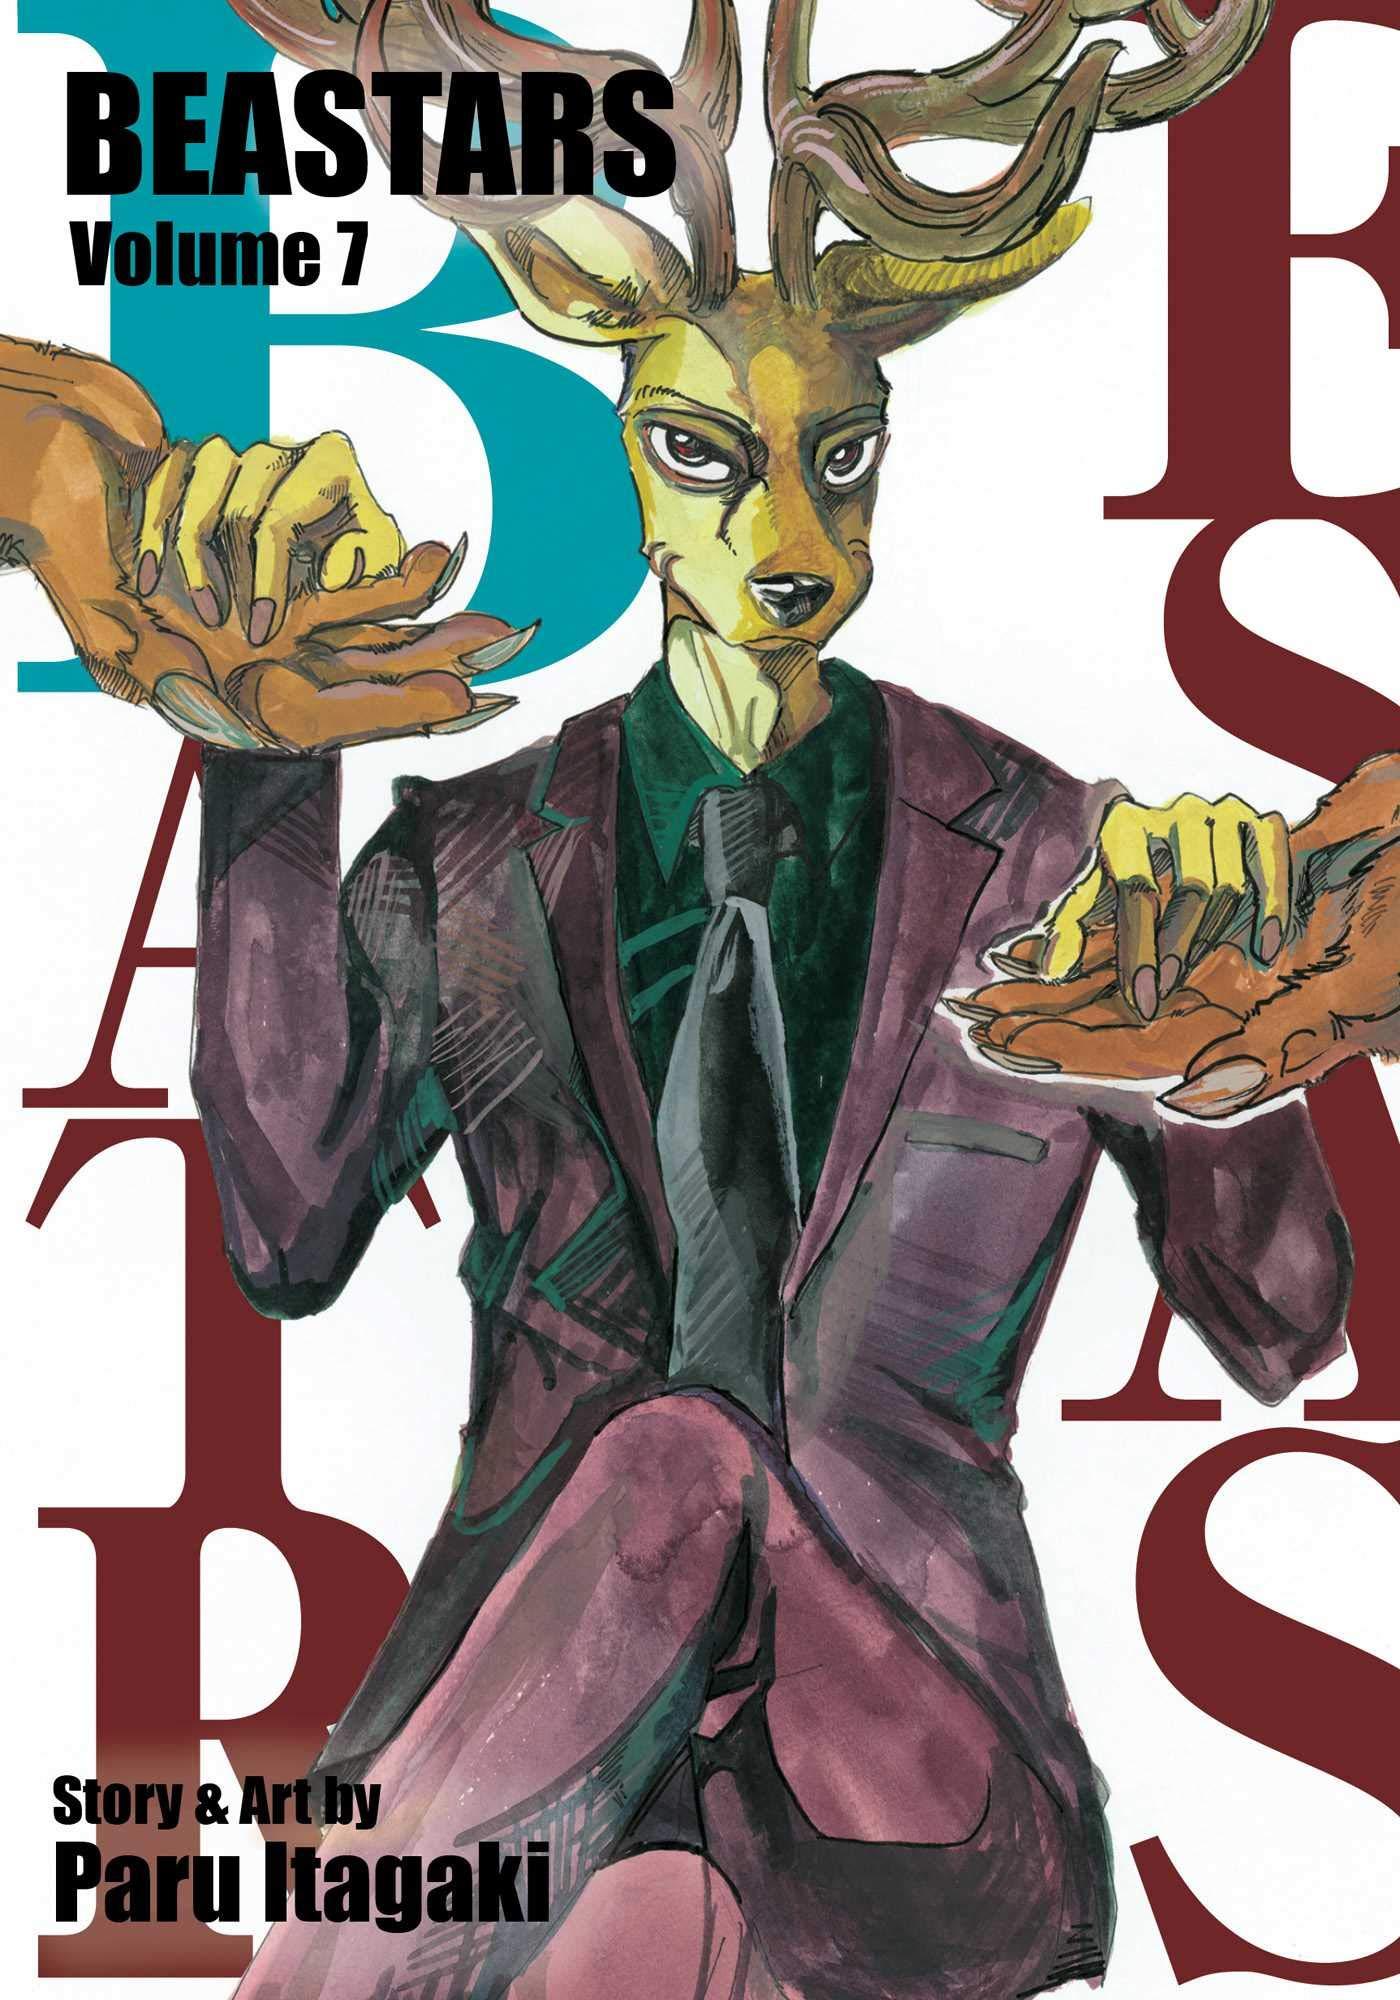 BEASTARS, Vol. 7